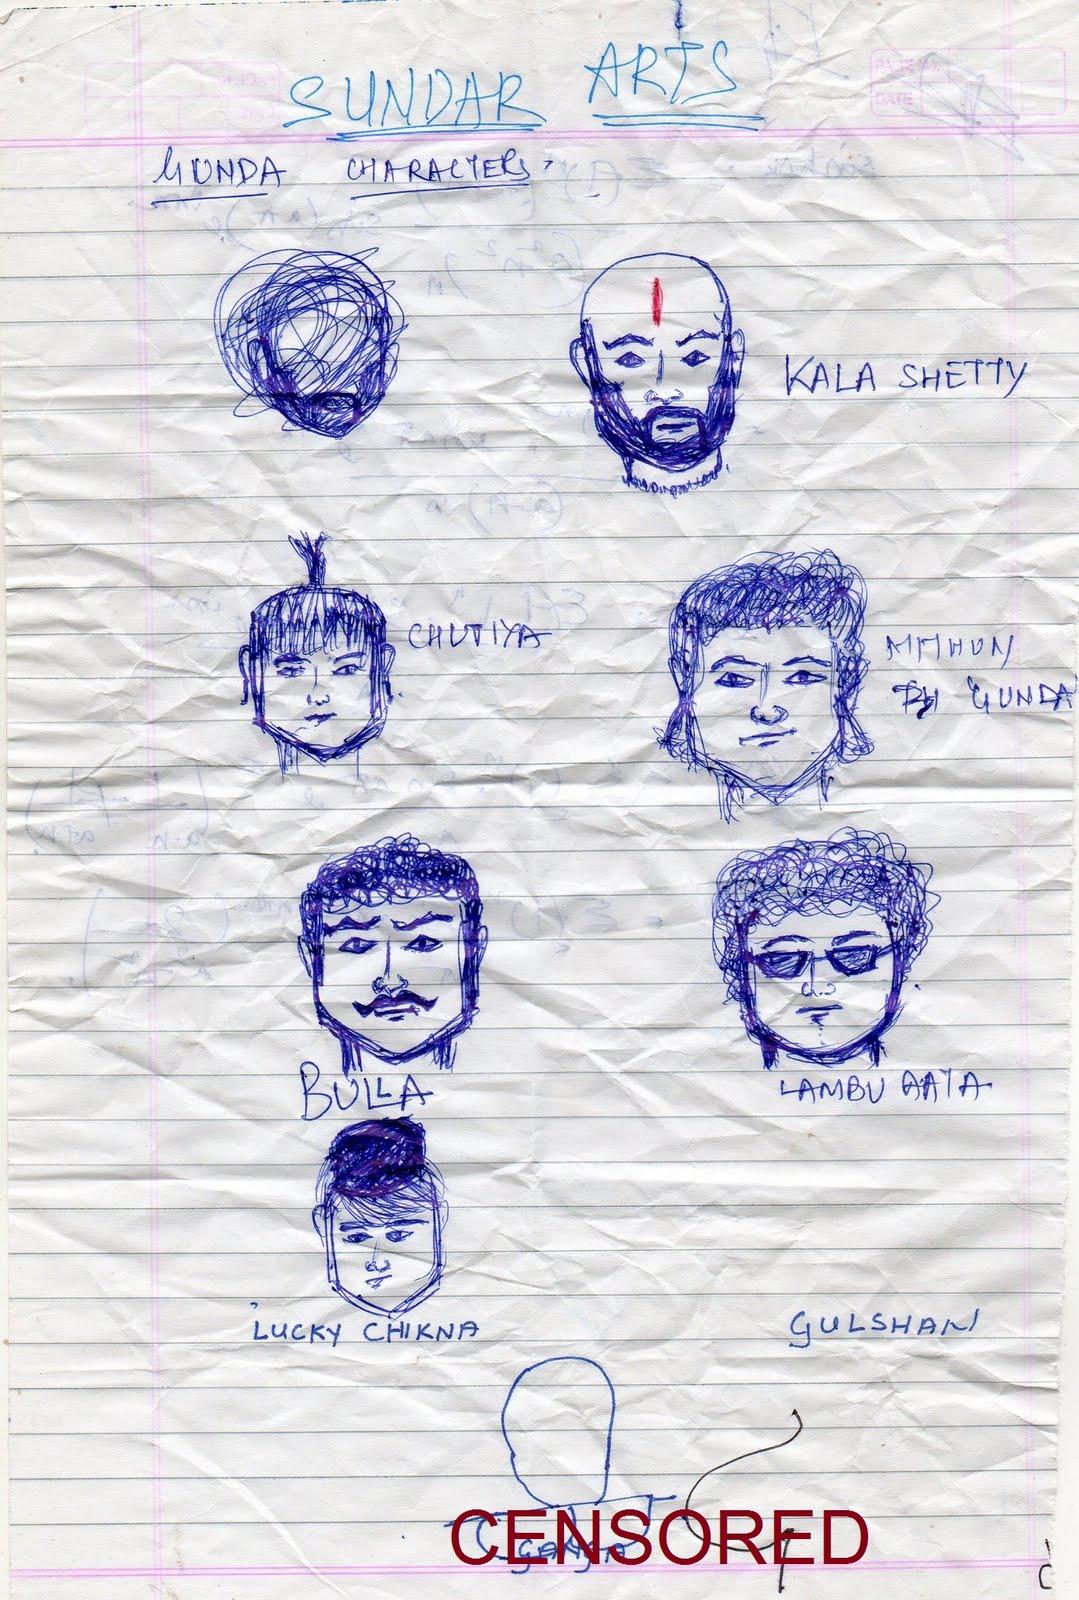 Gunda characters sketch